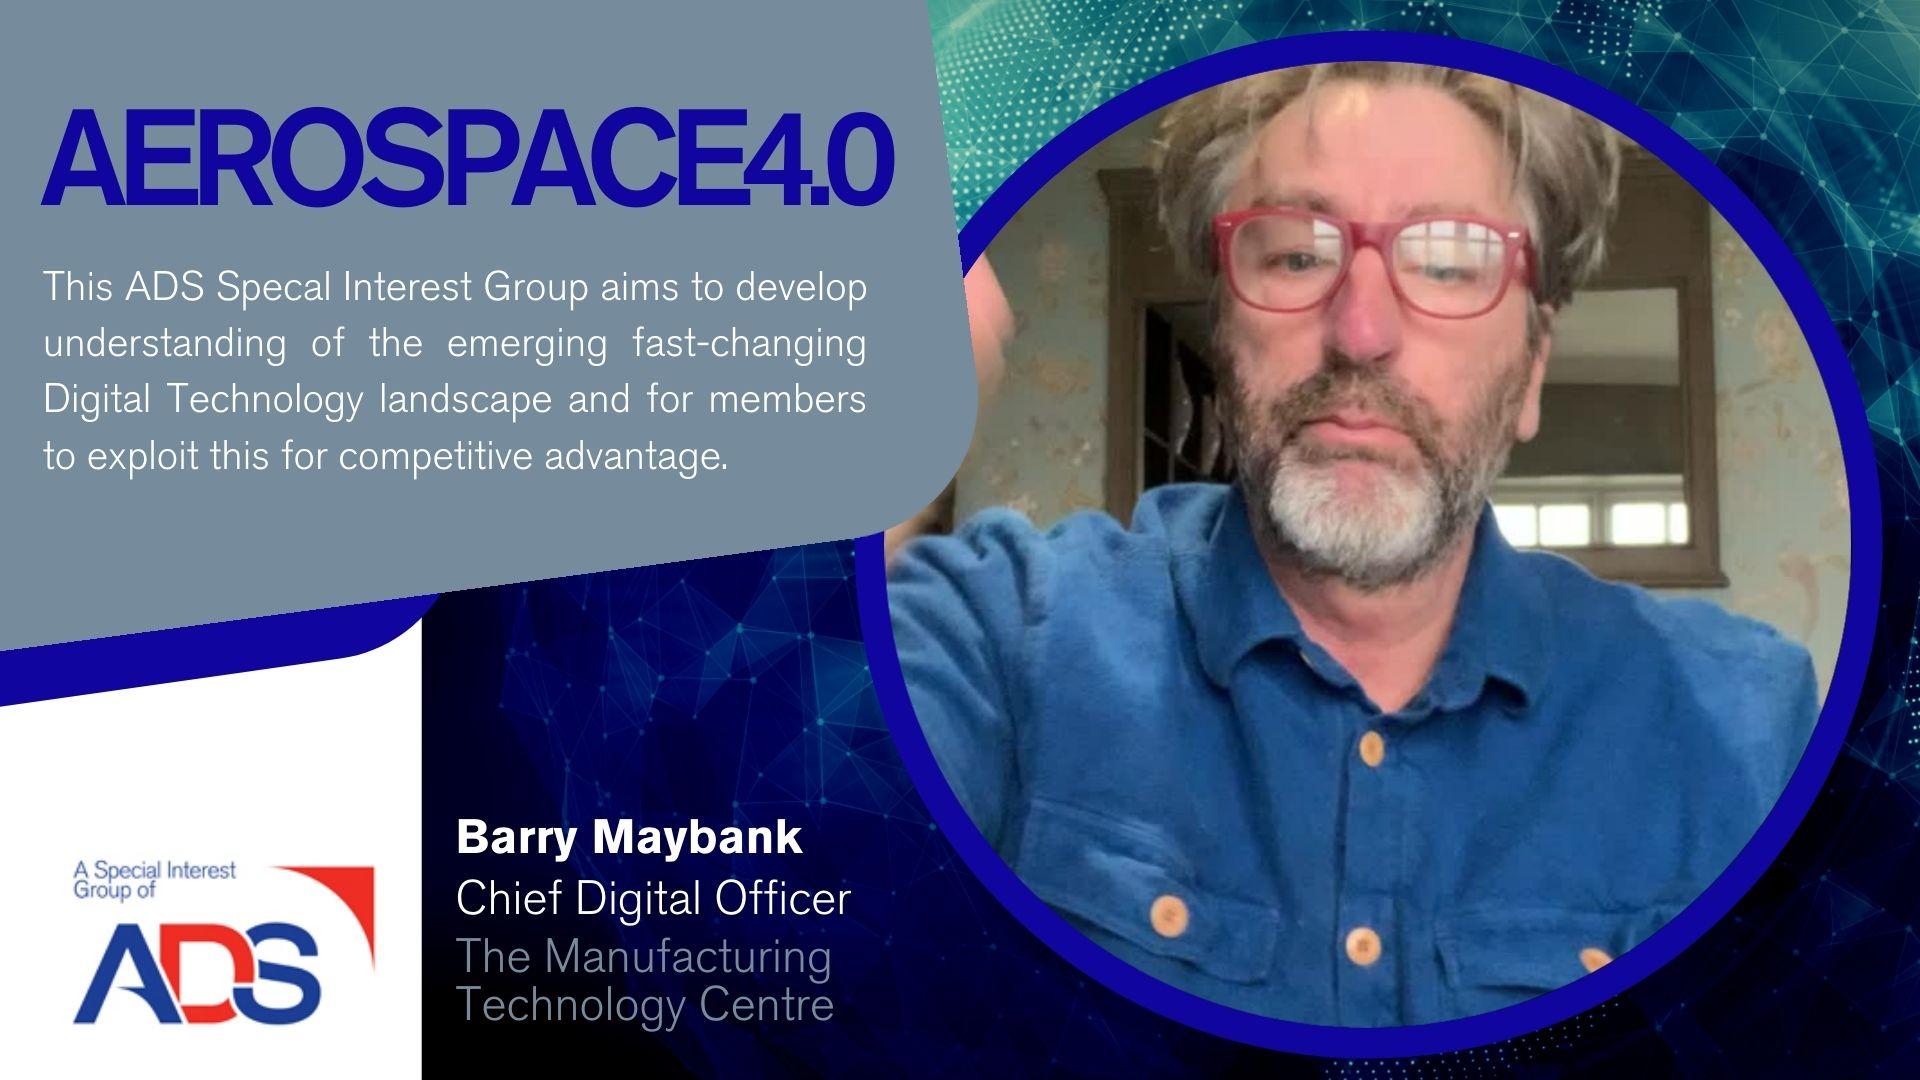 Barry Maybank